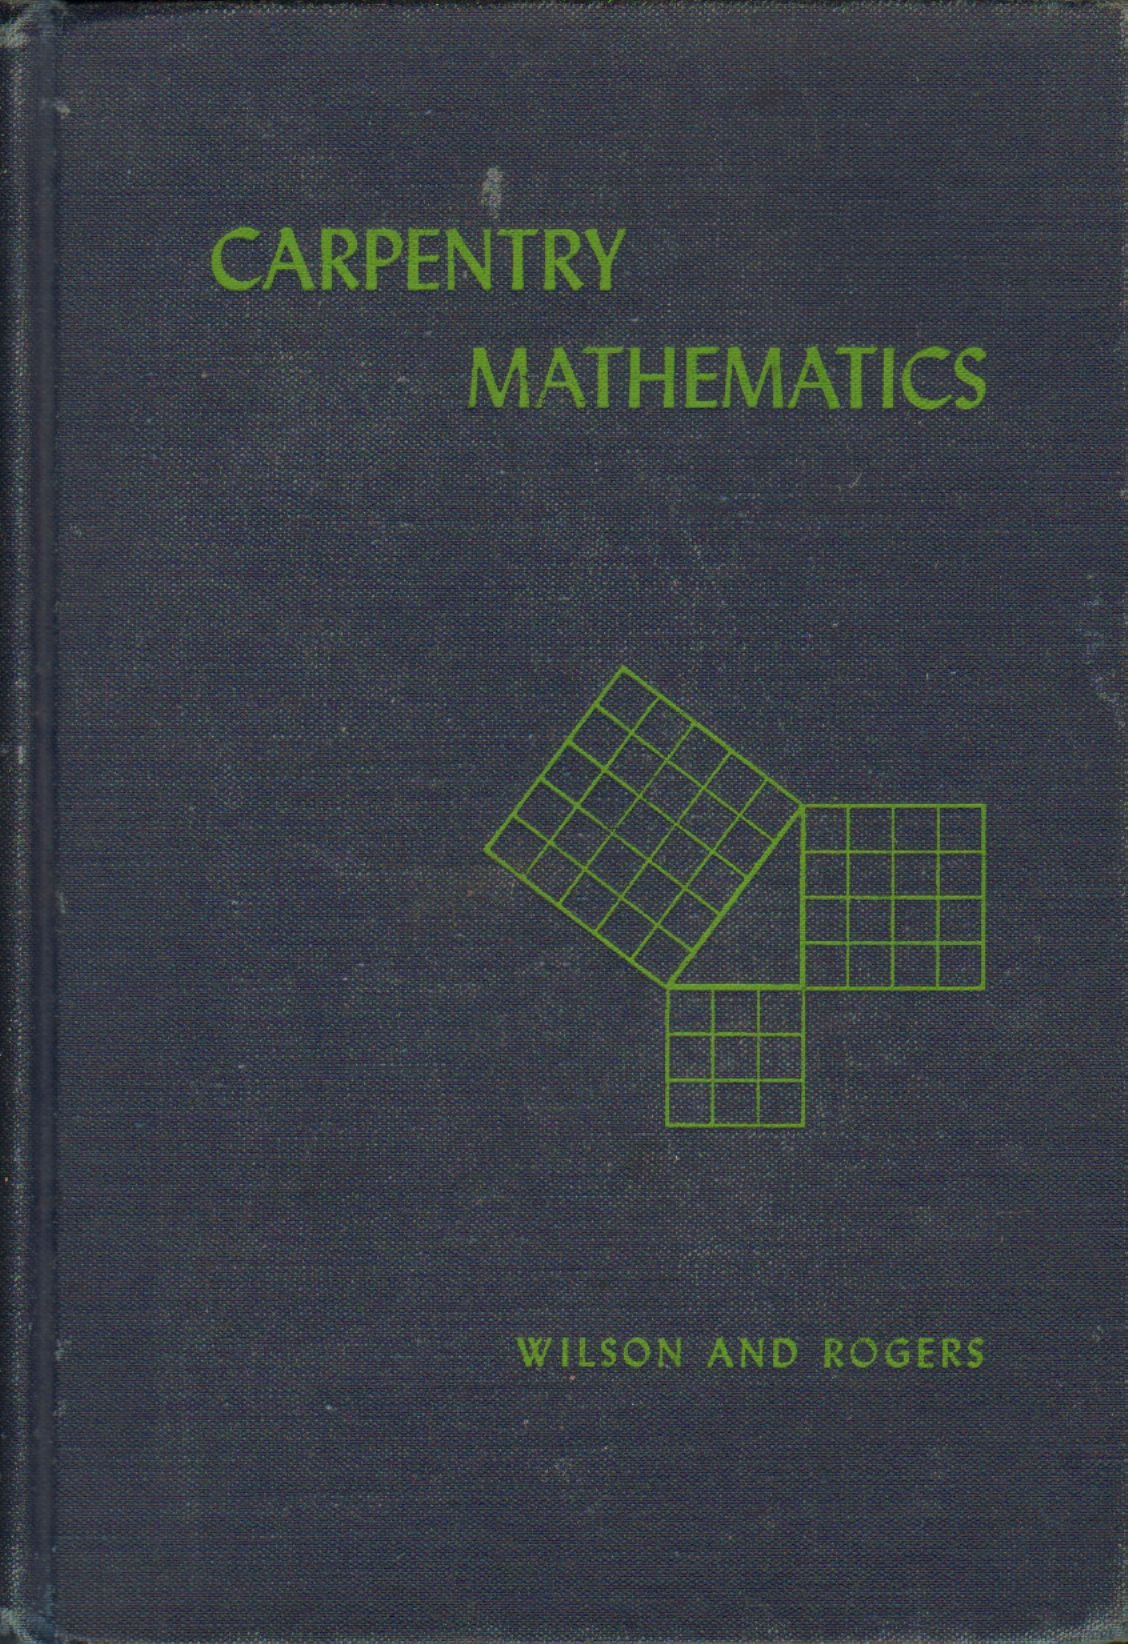 Carpentry Mathematics